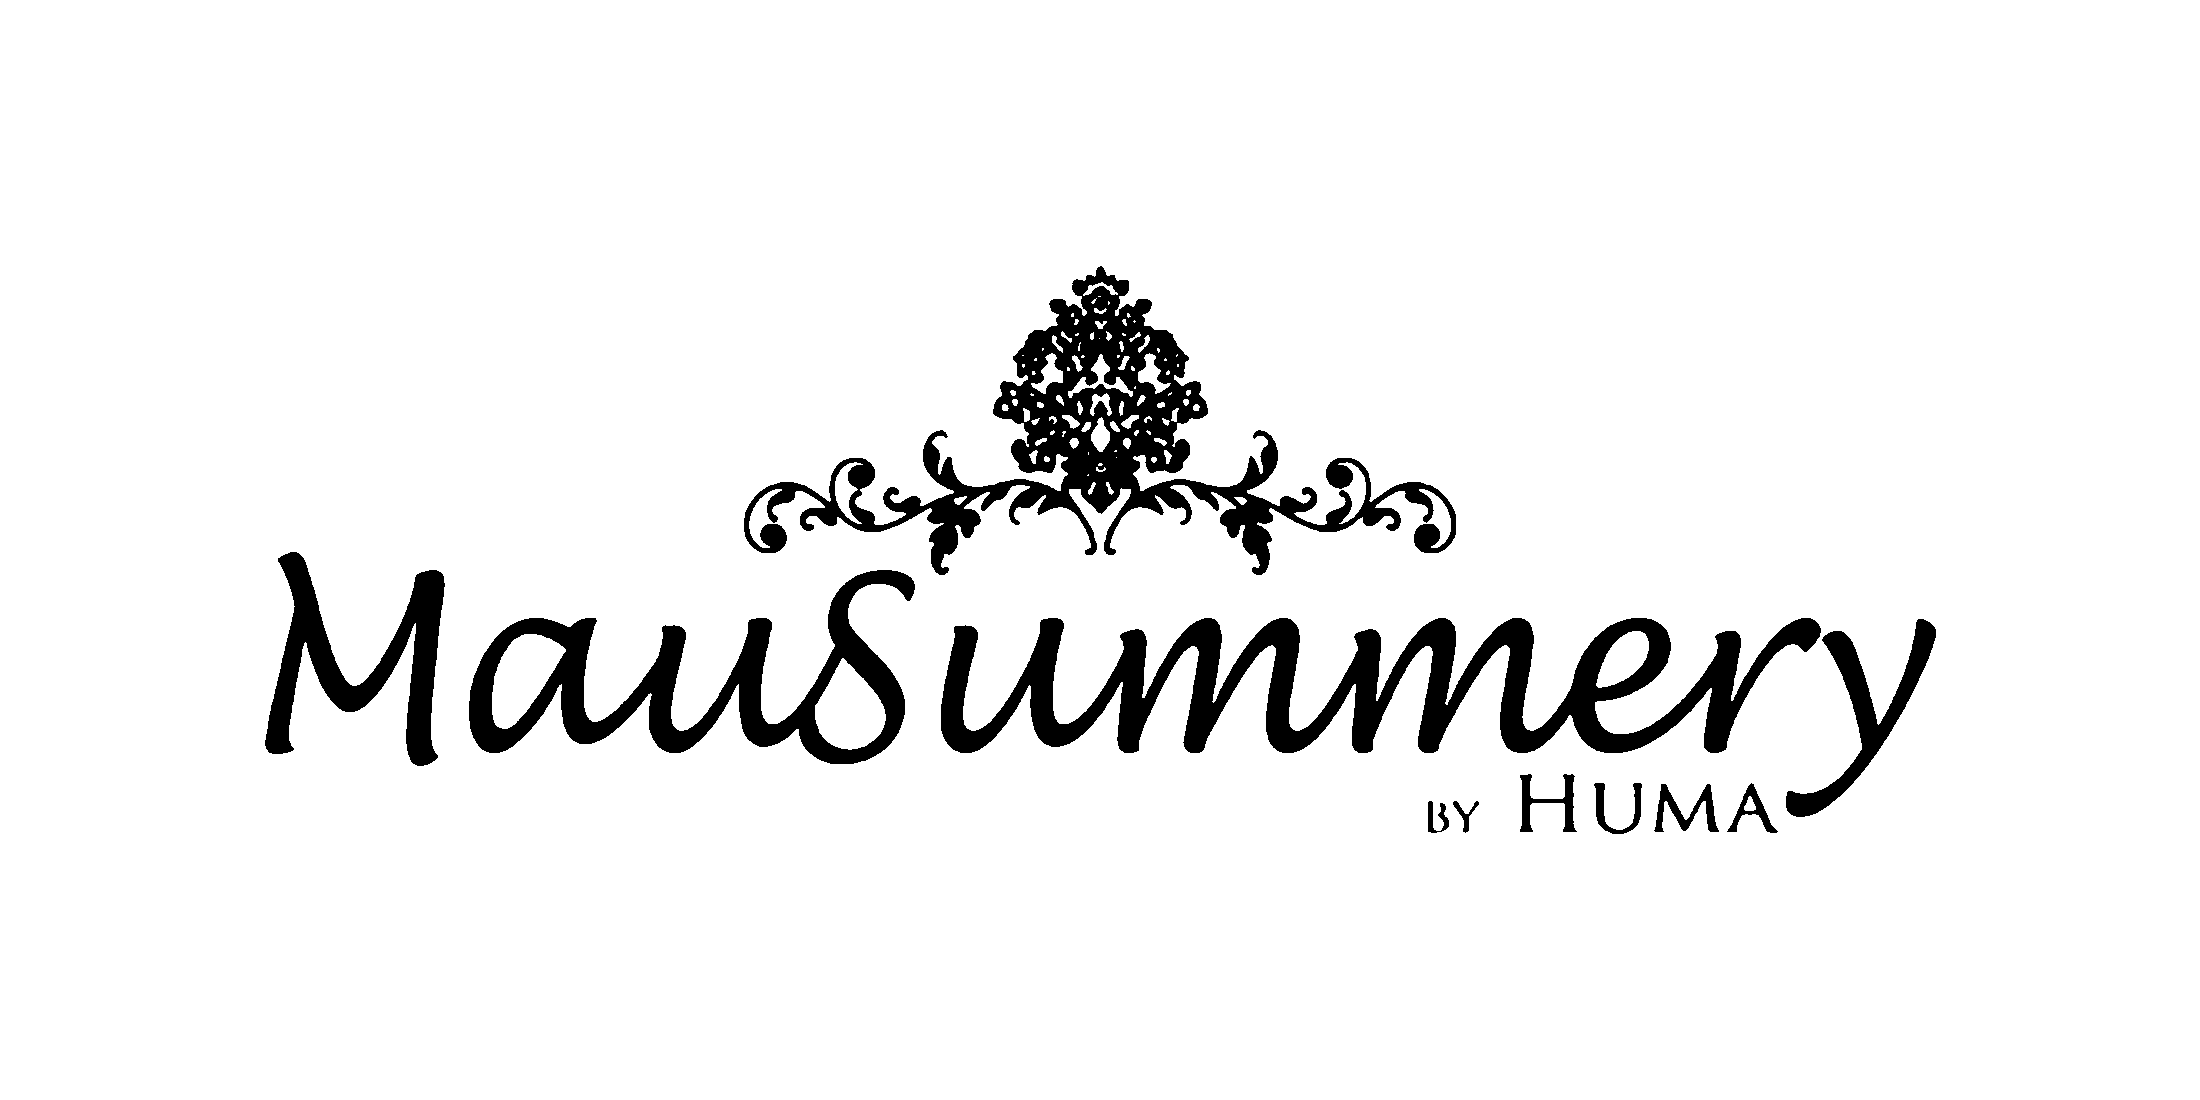 mausummery-by-huma-logo